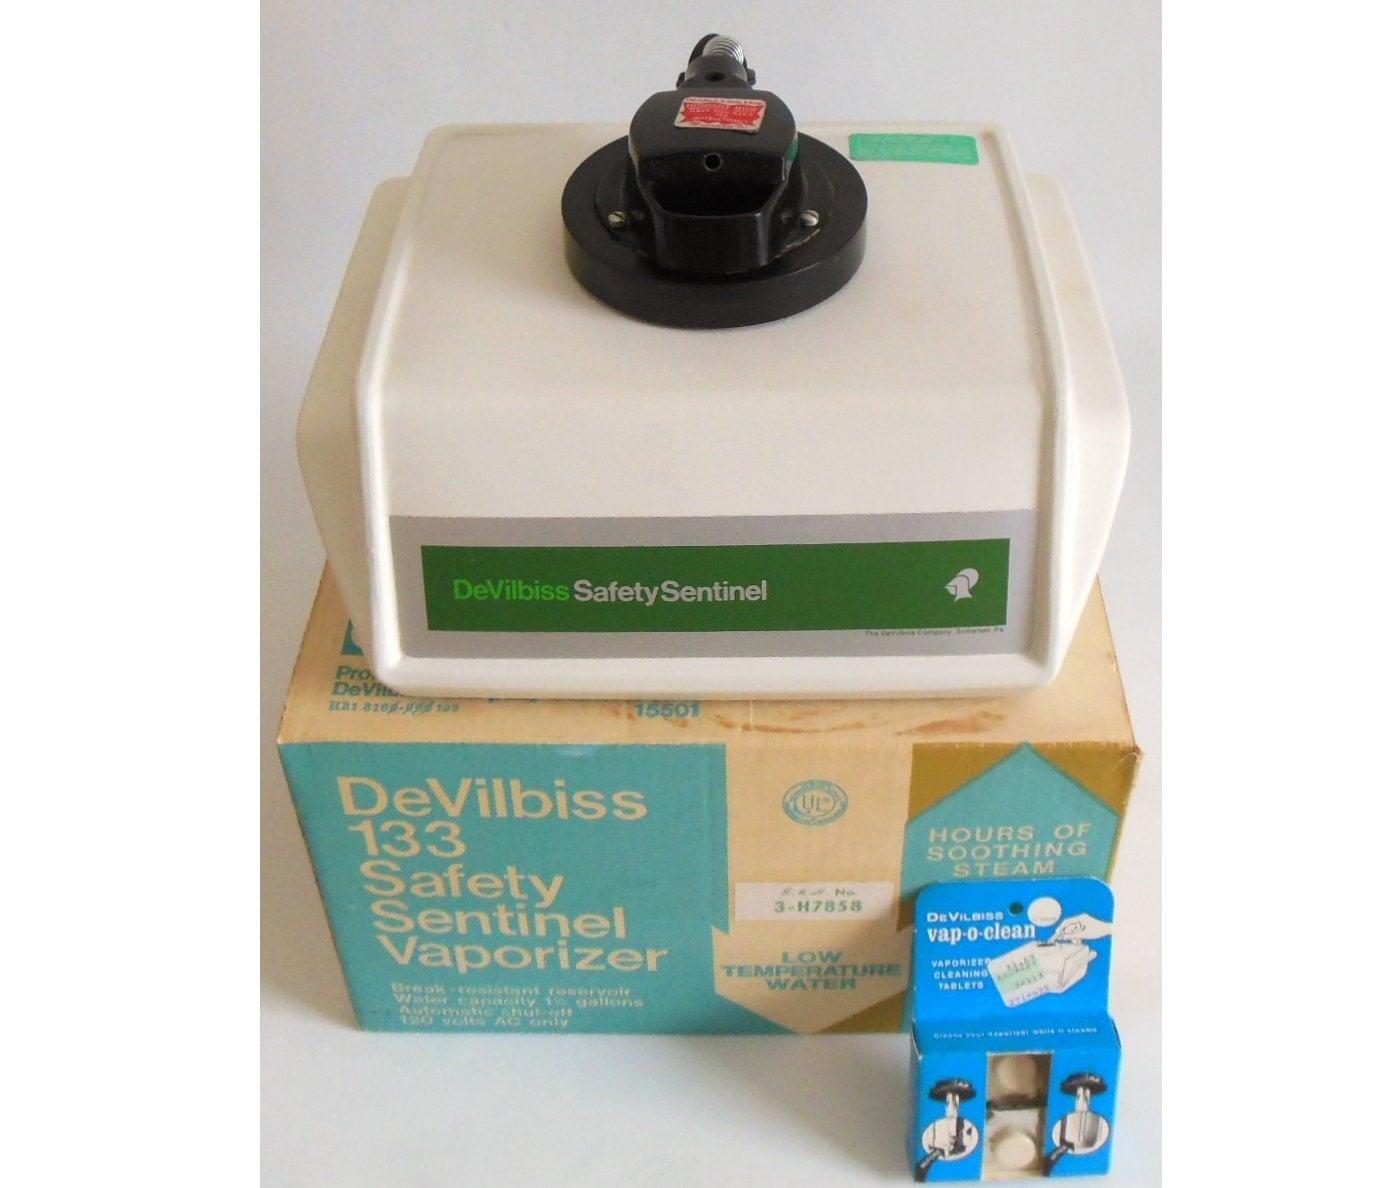 DeVilbiss Vaporizer Humidifier Vintage 1970s by LaurasLastDitch #097CC2